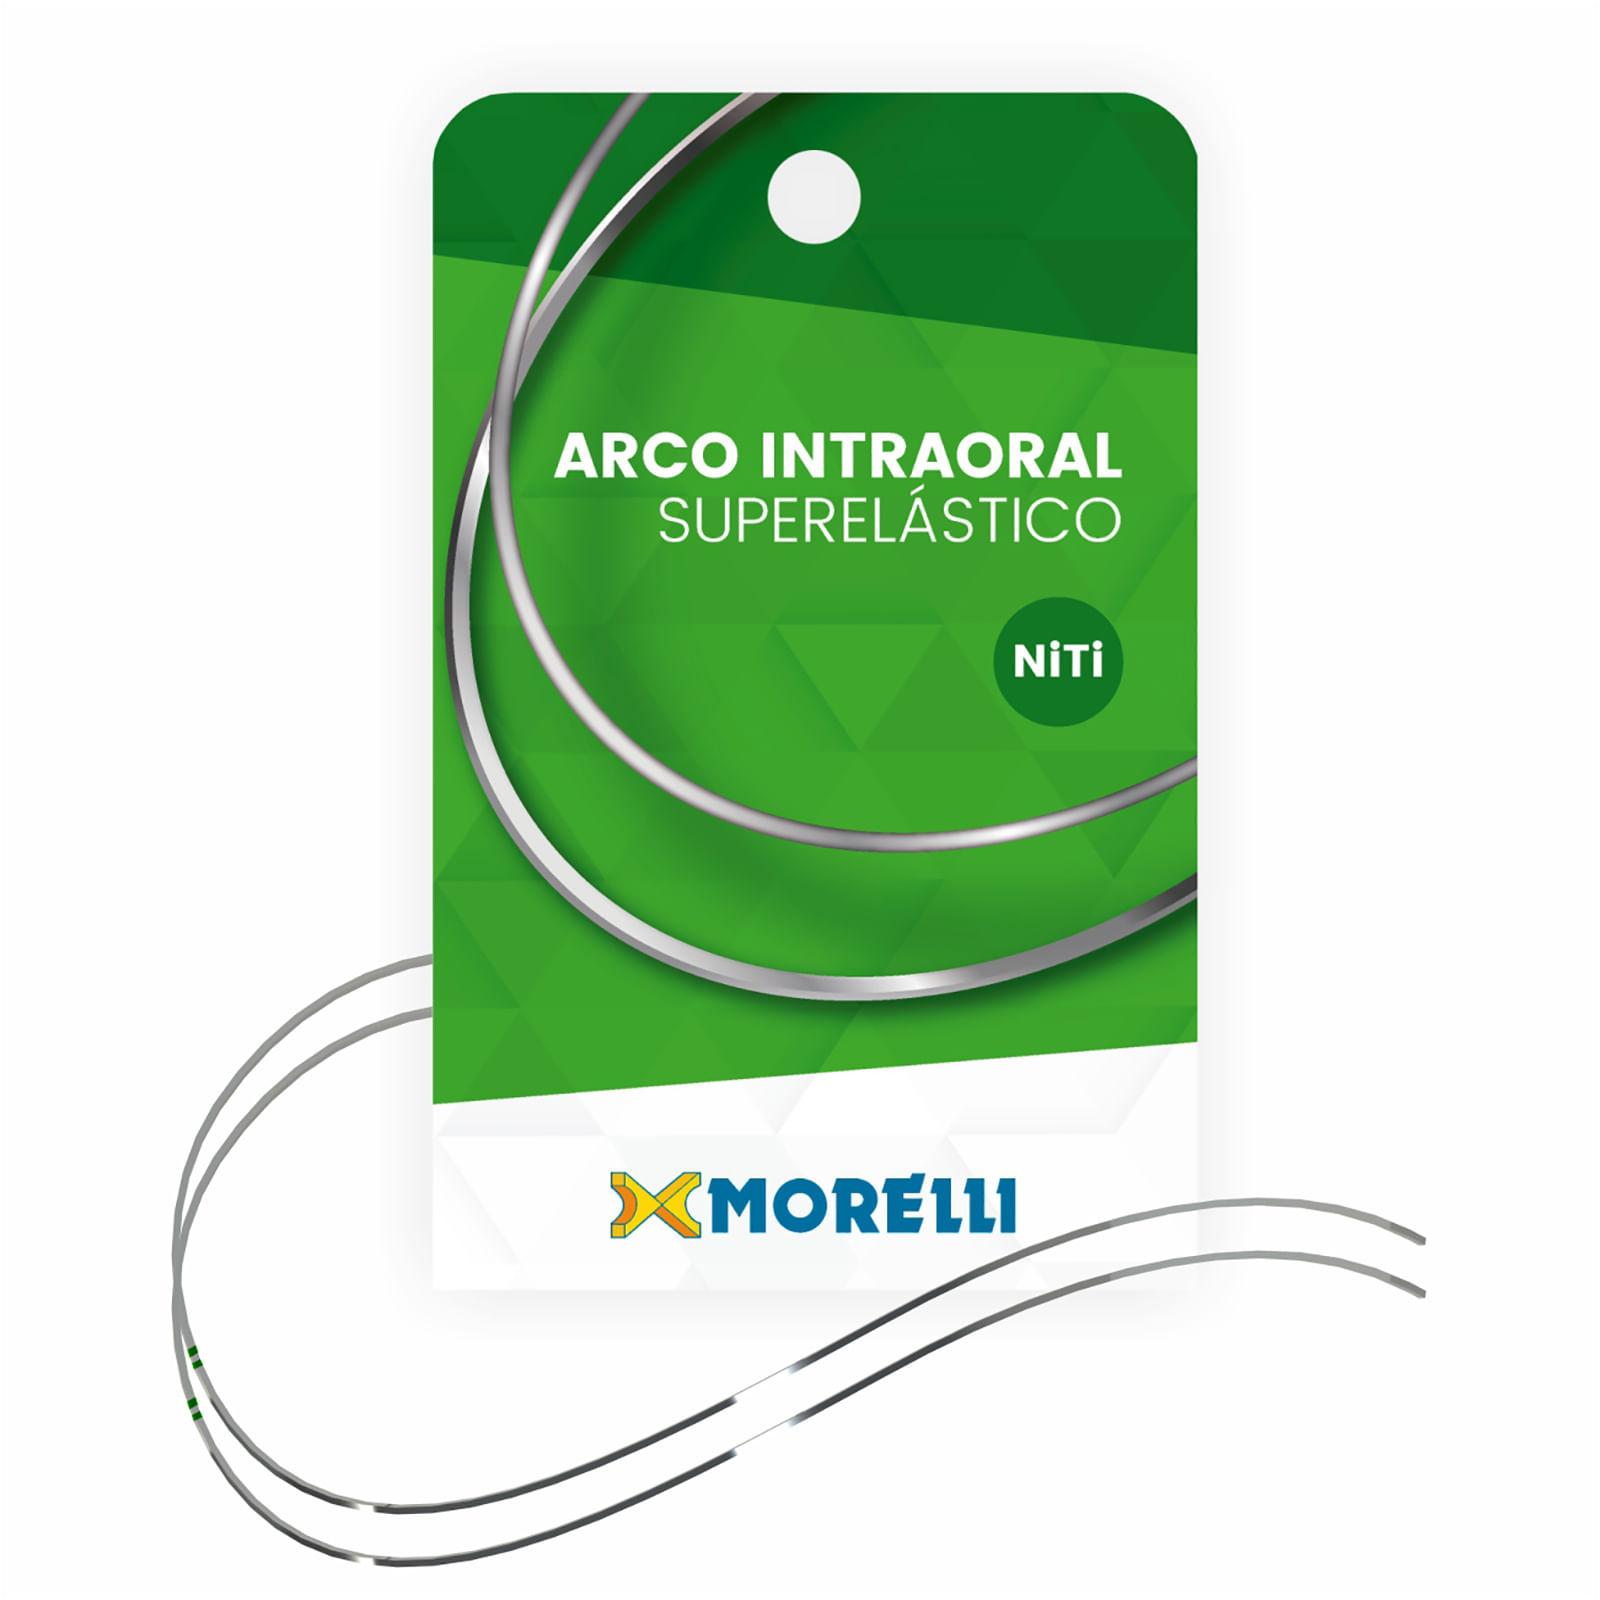 ARCO-NITINOL-SUPERELASTICO-CURVA-REVERSO-MEDIO---INFERIOR---NITI---QUADRADO-.016-X.016----MORELLI